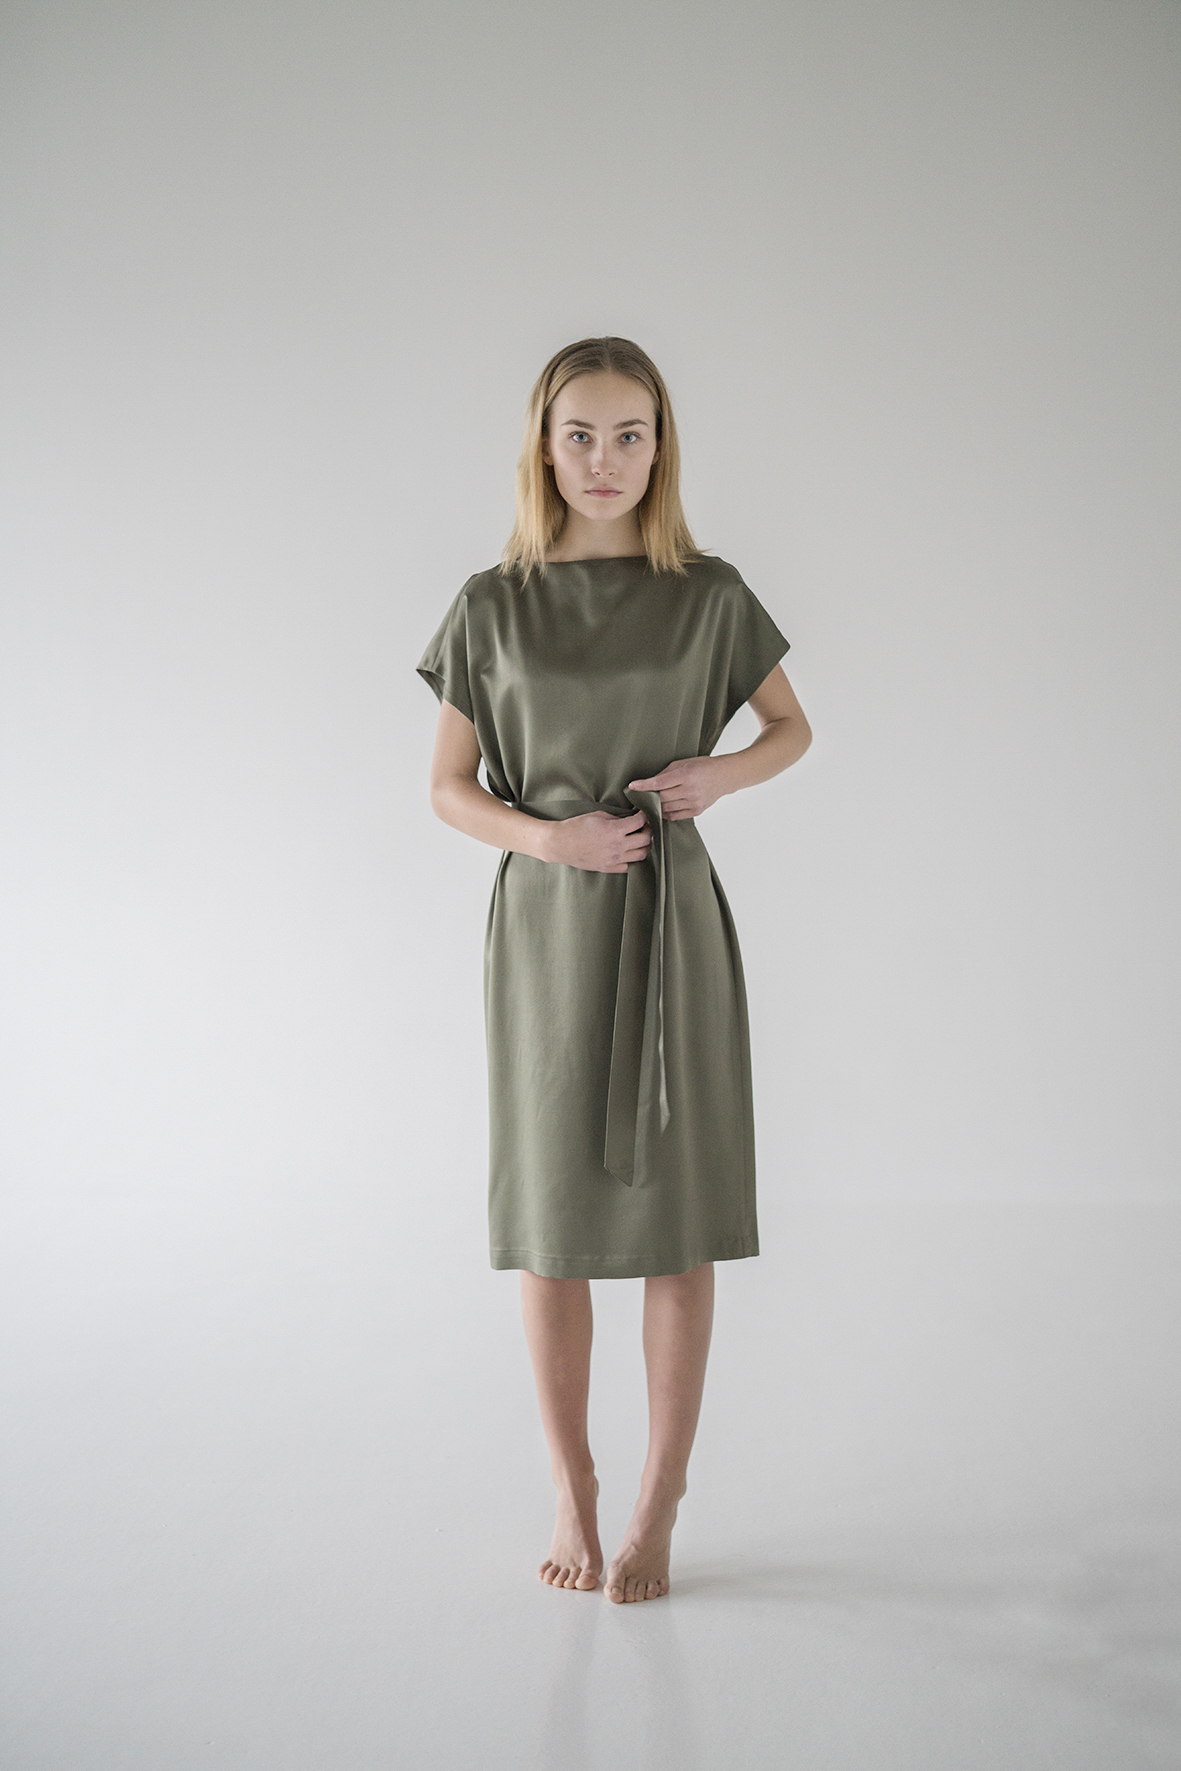 Kielo's timeless sage green  Blake Dress  made from Ahimsa (or Peace) silk.